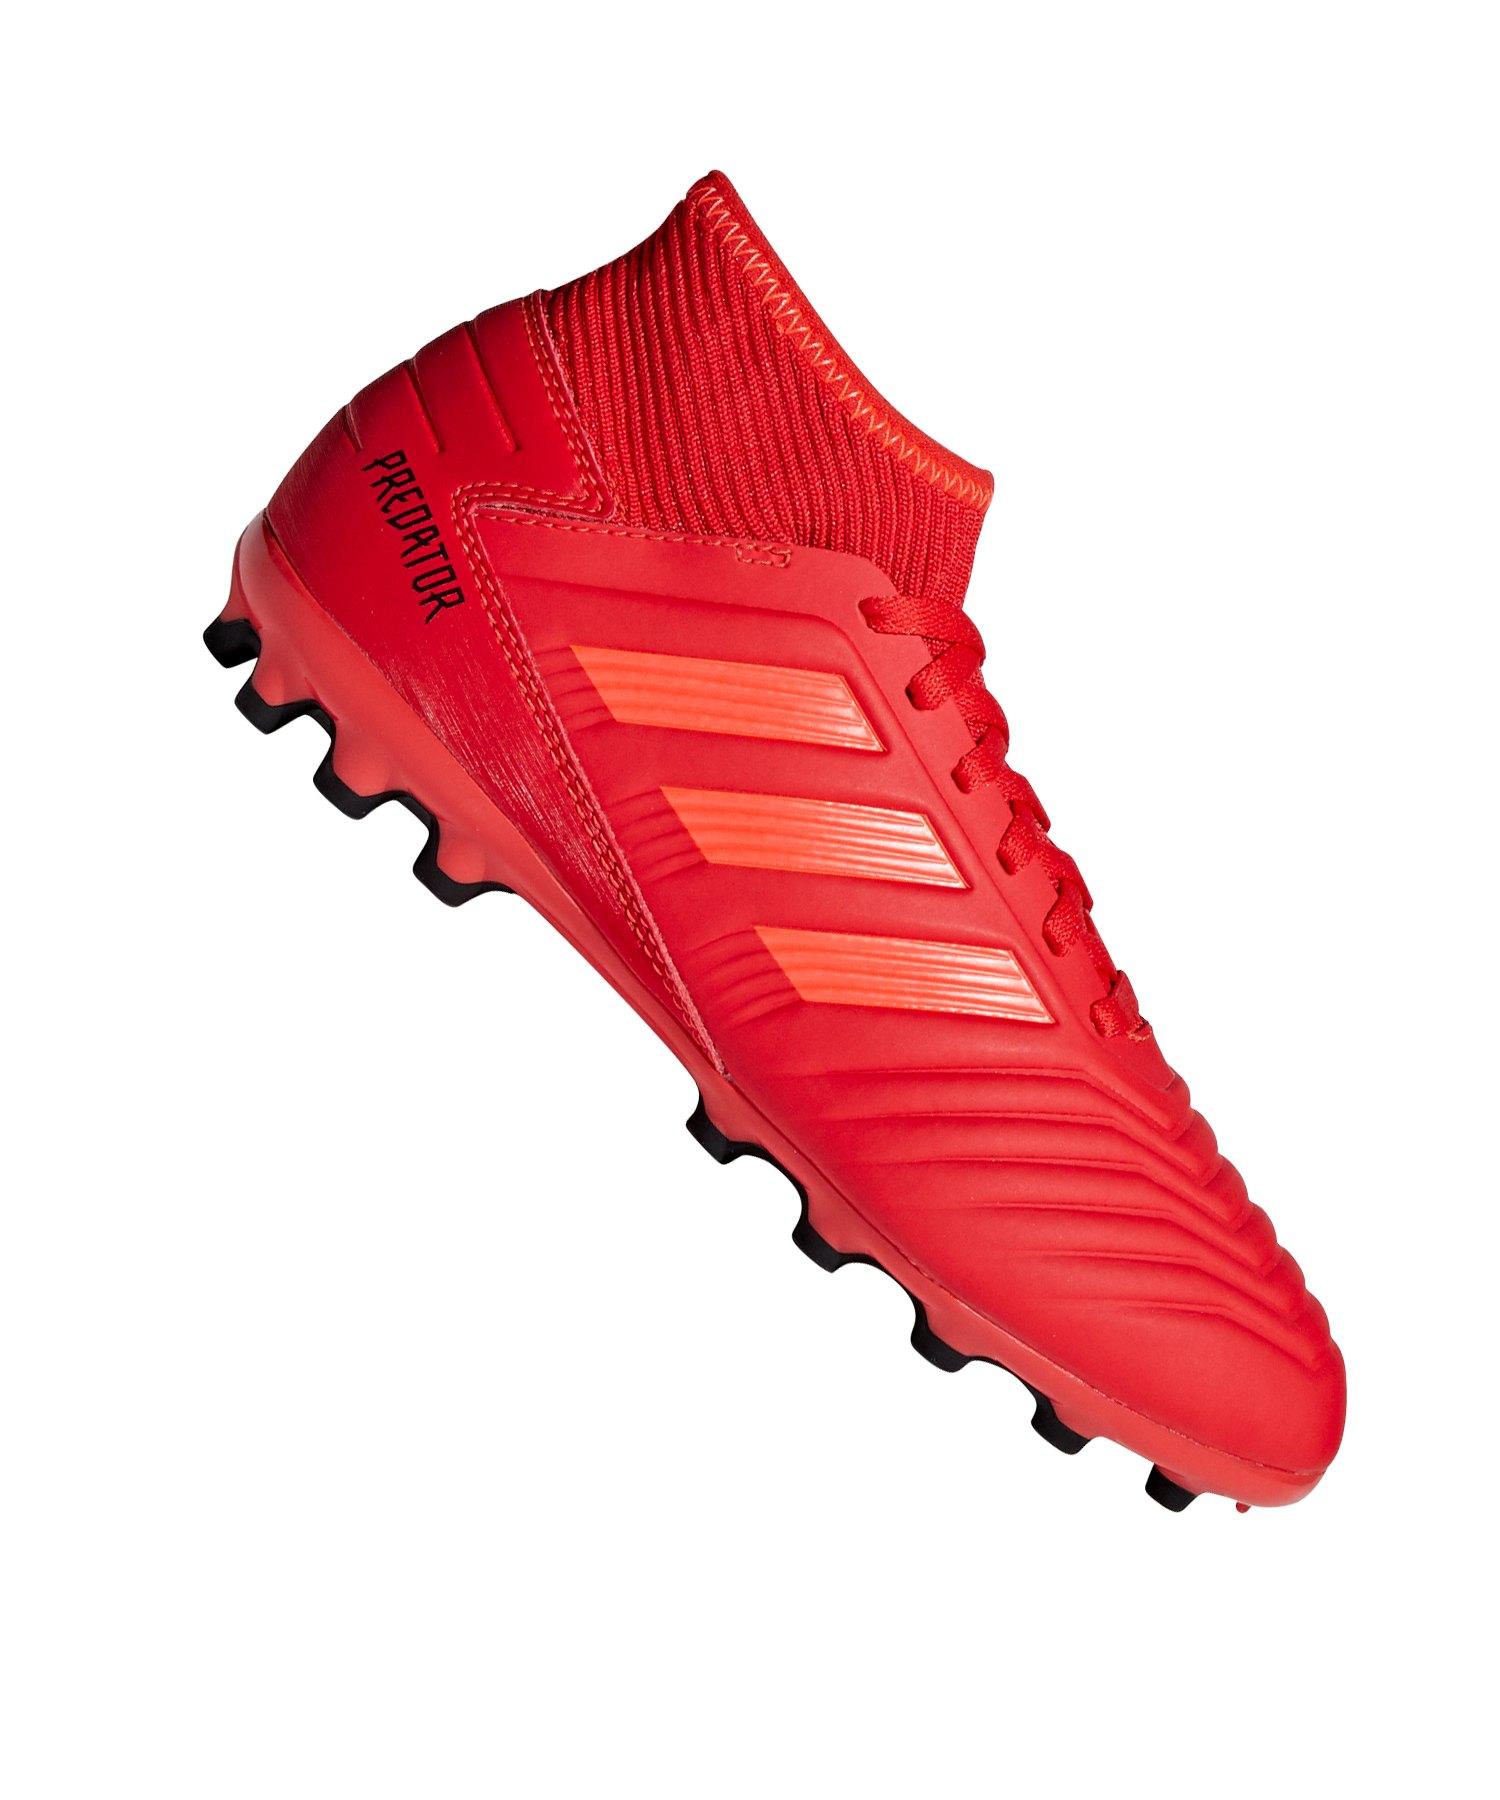 adidas Predator 19.3 AG J Kids Rot Schwarz - rot